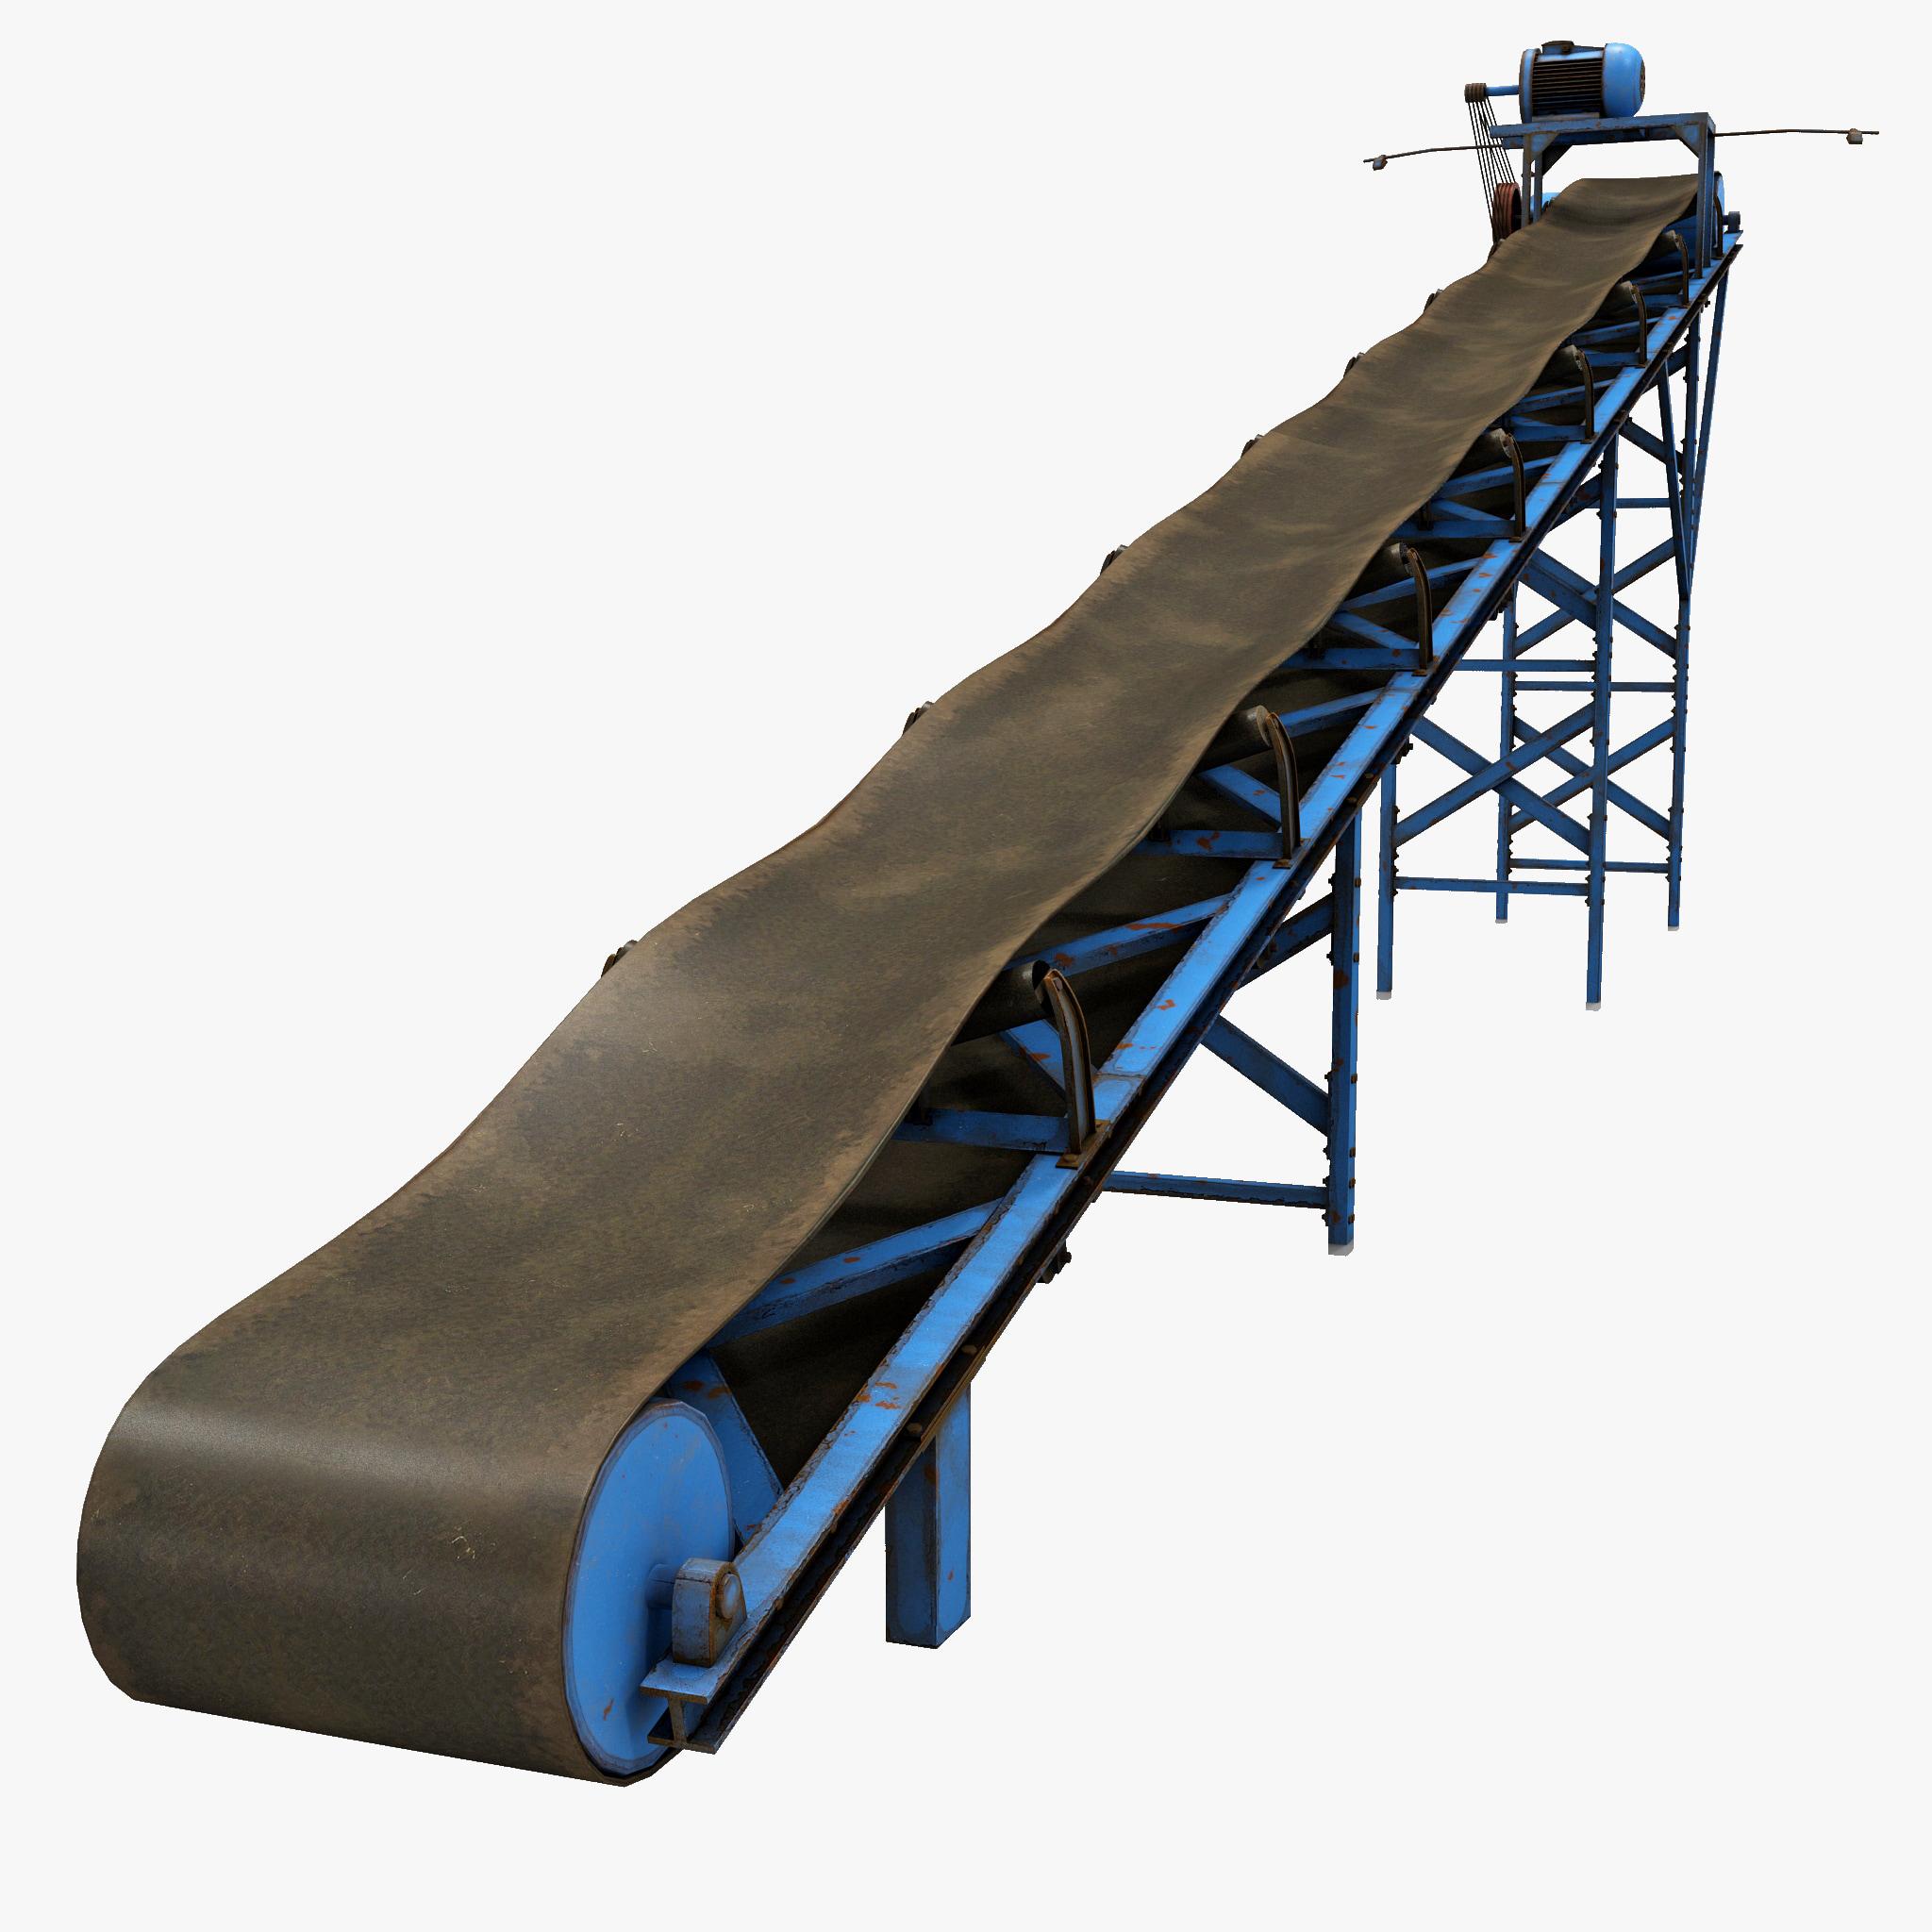 Free Scale Drawing Software 3d Conveyor Belt Model